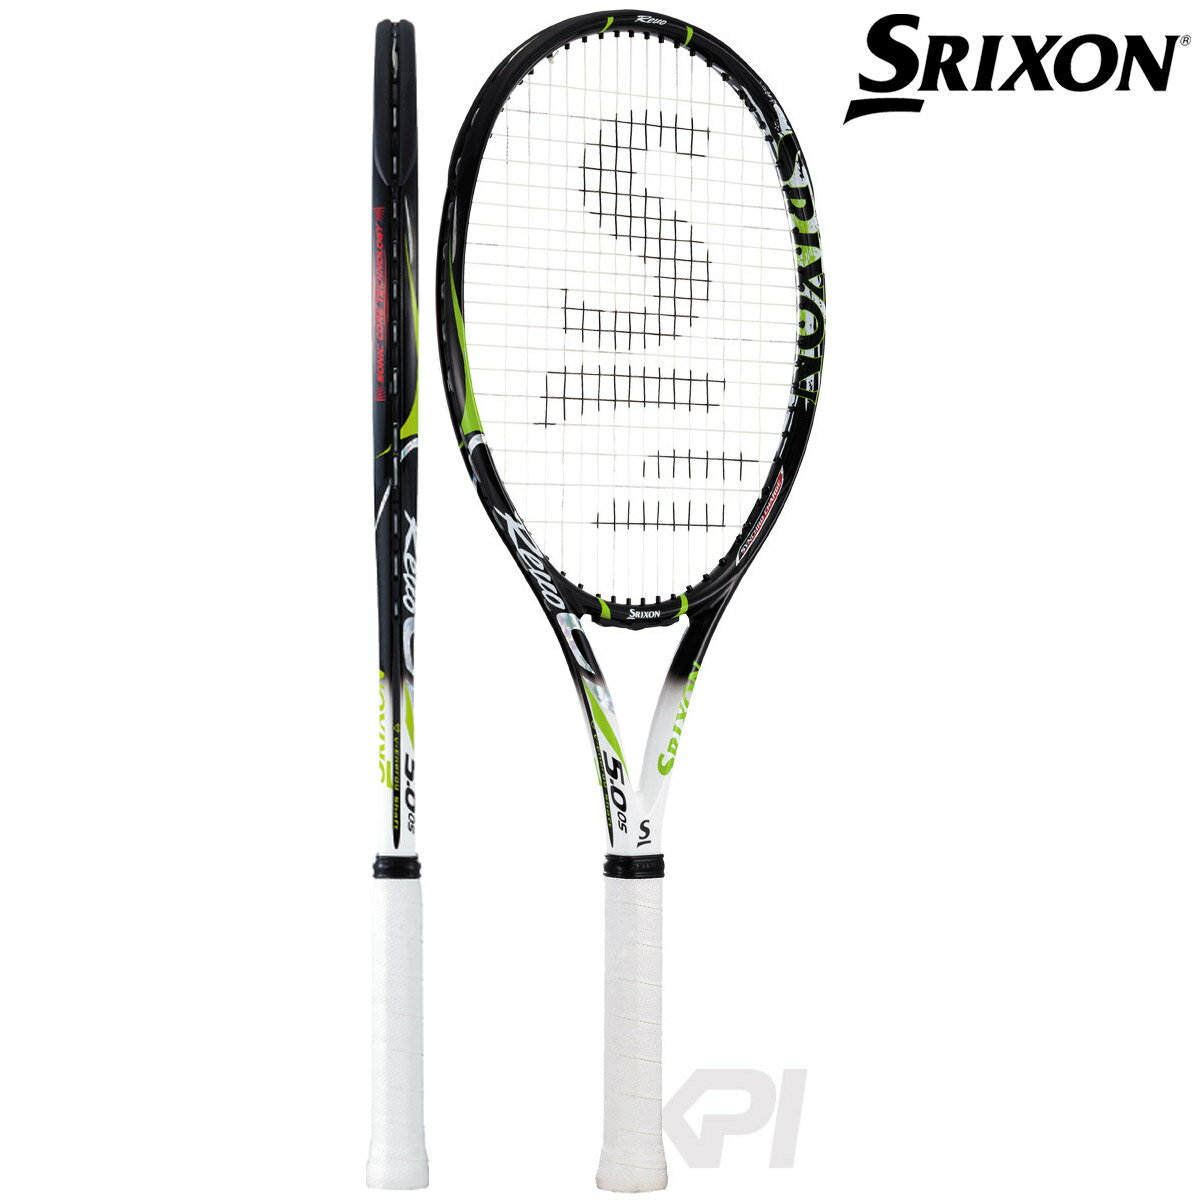 SRIXON(スリクソン)【SRIXON REVO CV 5.0 OS(スリクソンレヴォ 5.0 OS) SR21604】硬式テニスラケット【prospo】